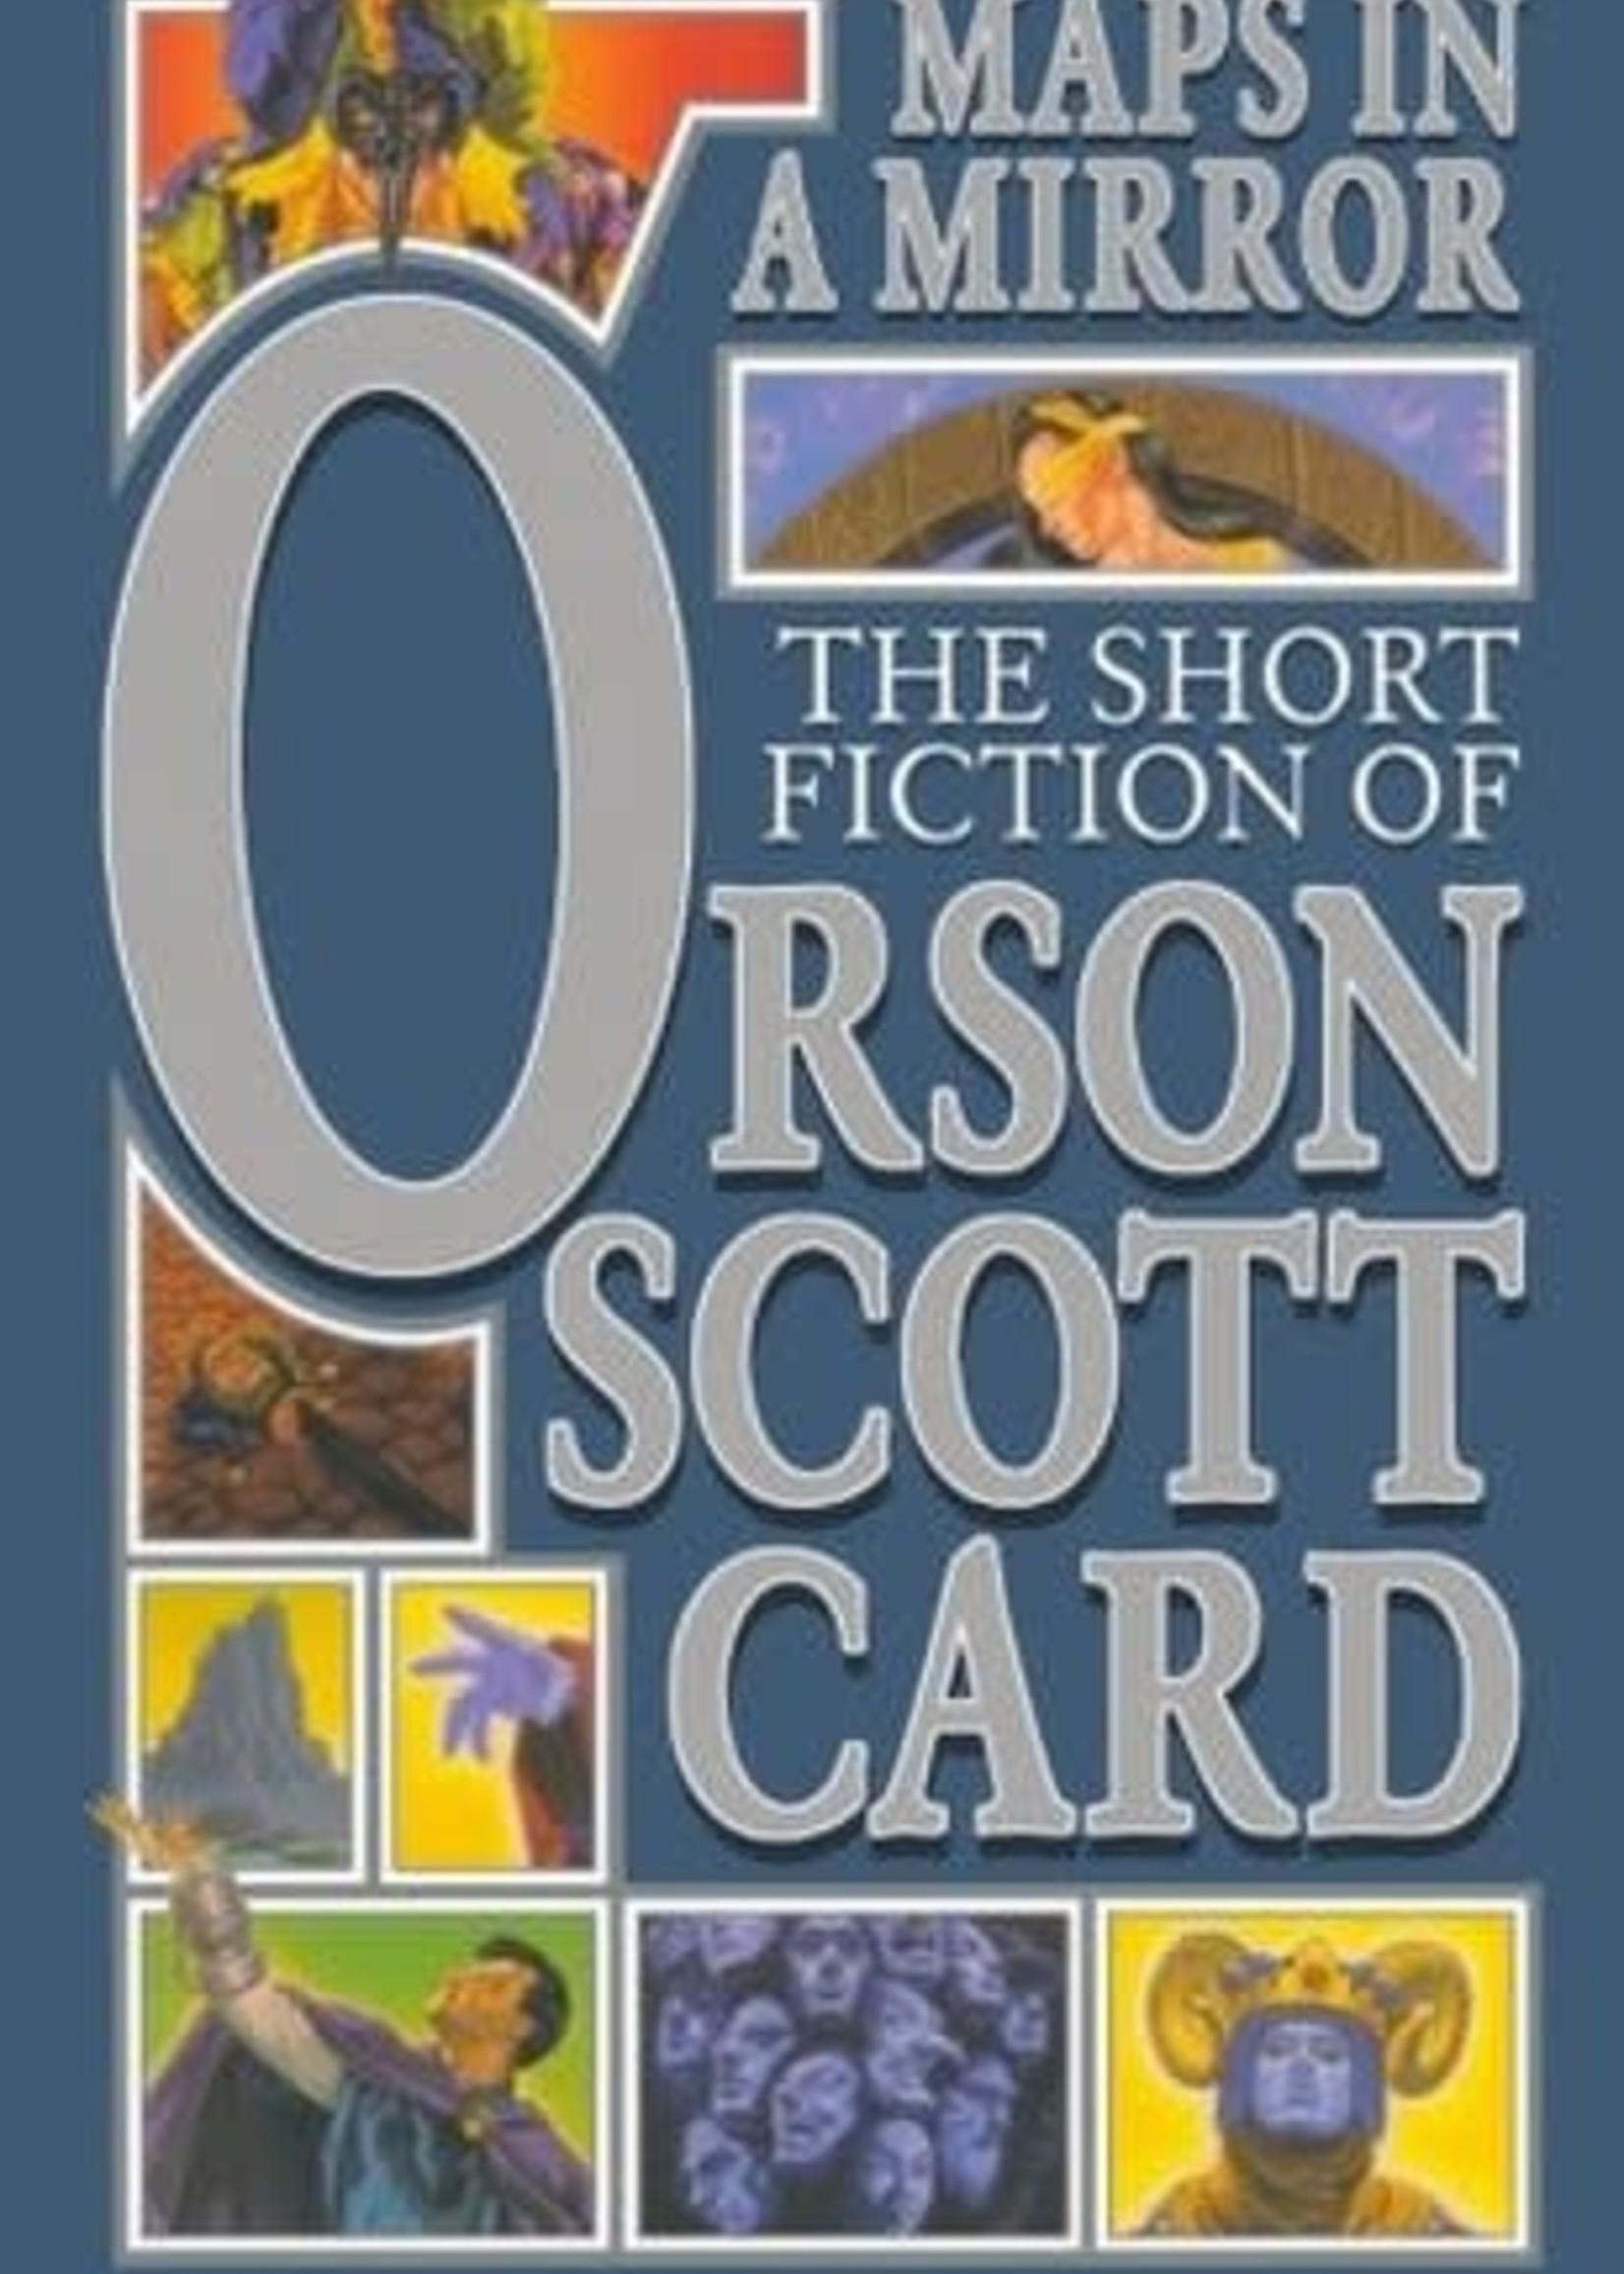 Maps in a Mirror by Orson Scott Card